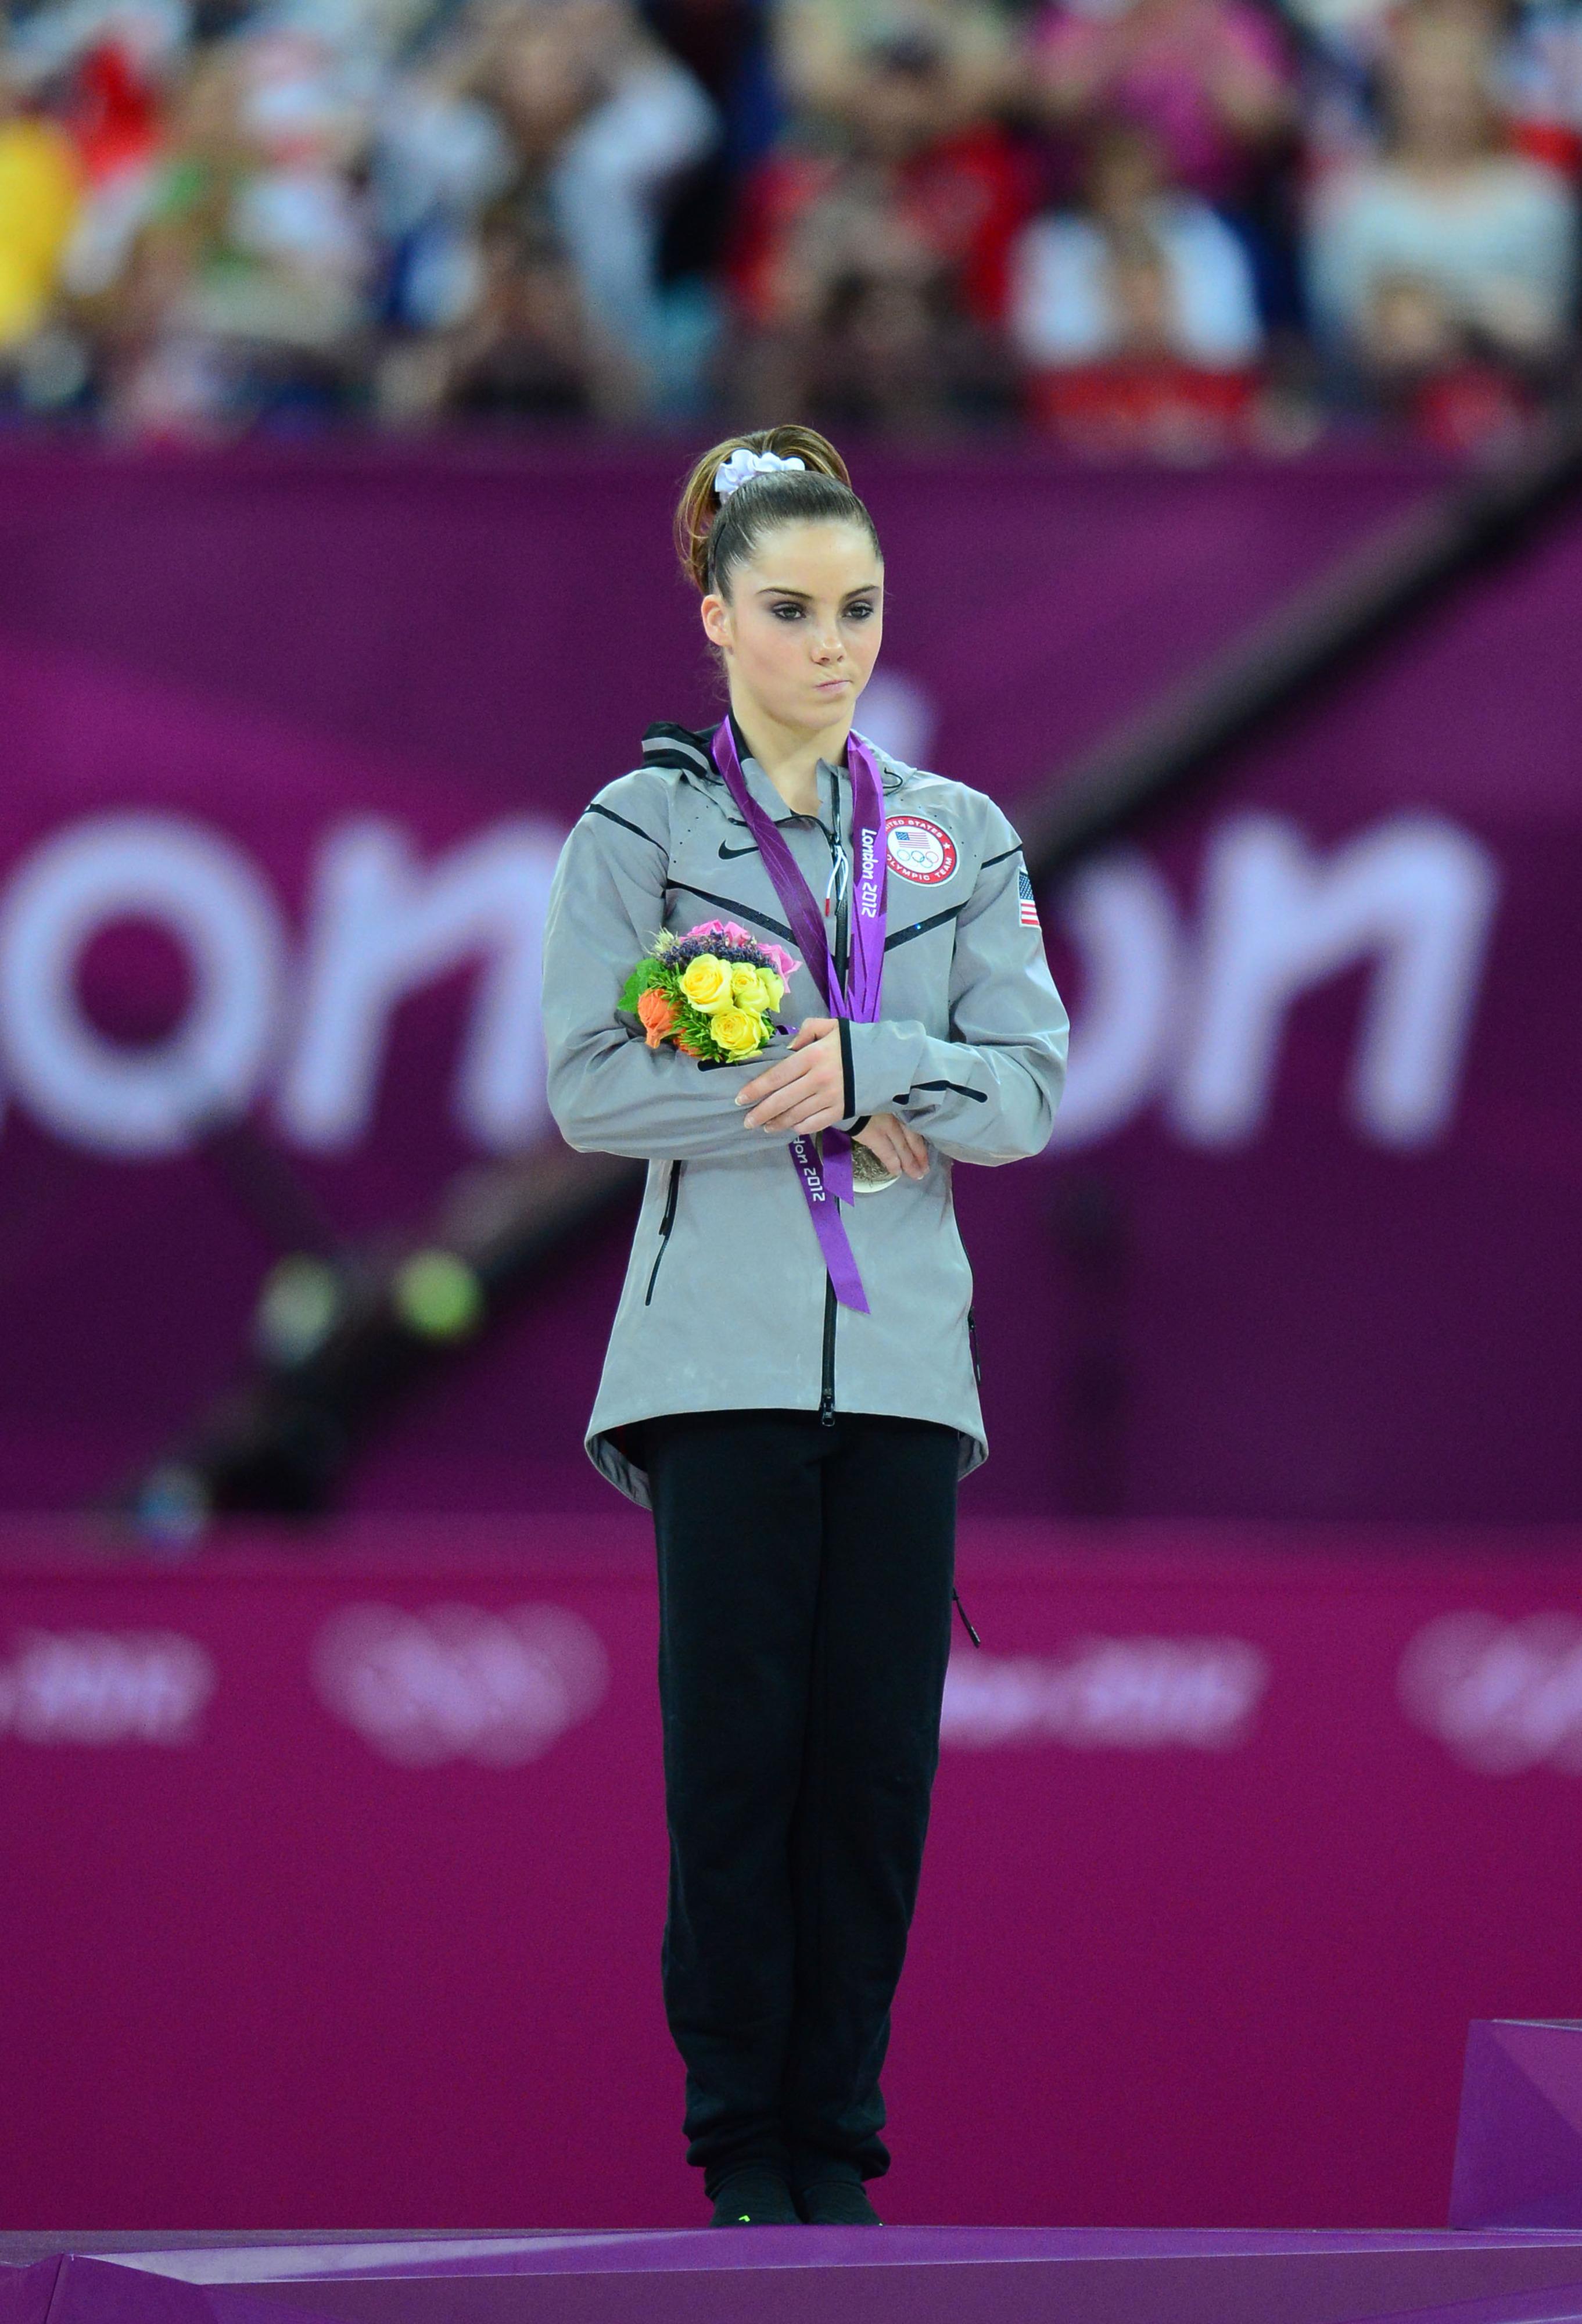 The saddest athletes of 2012